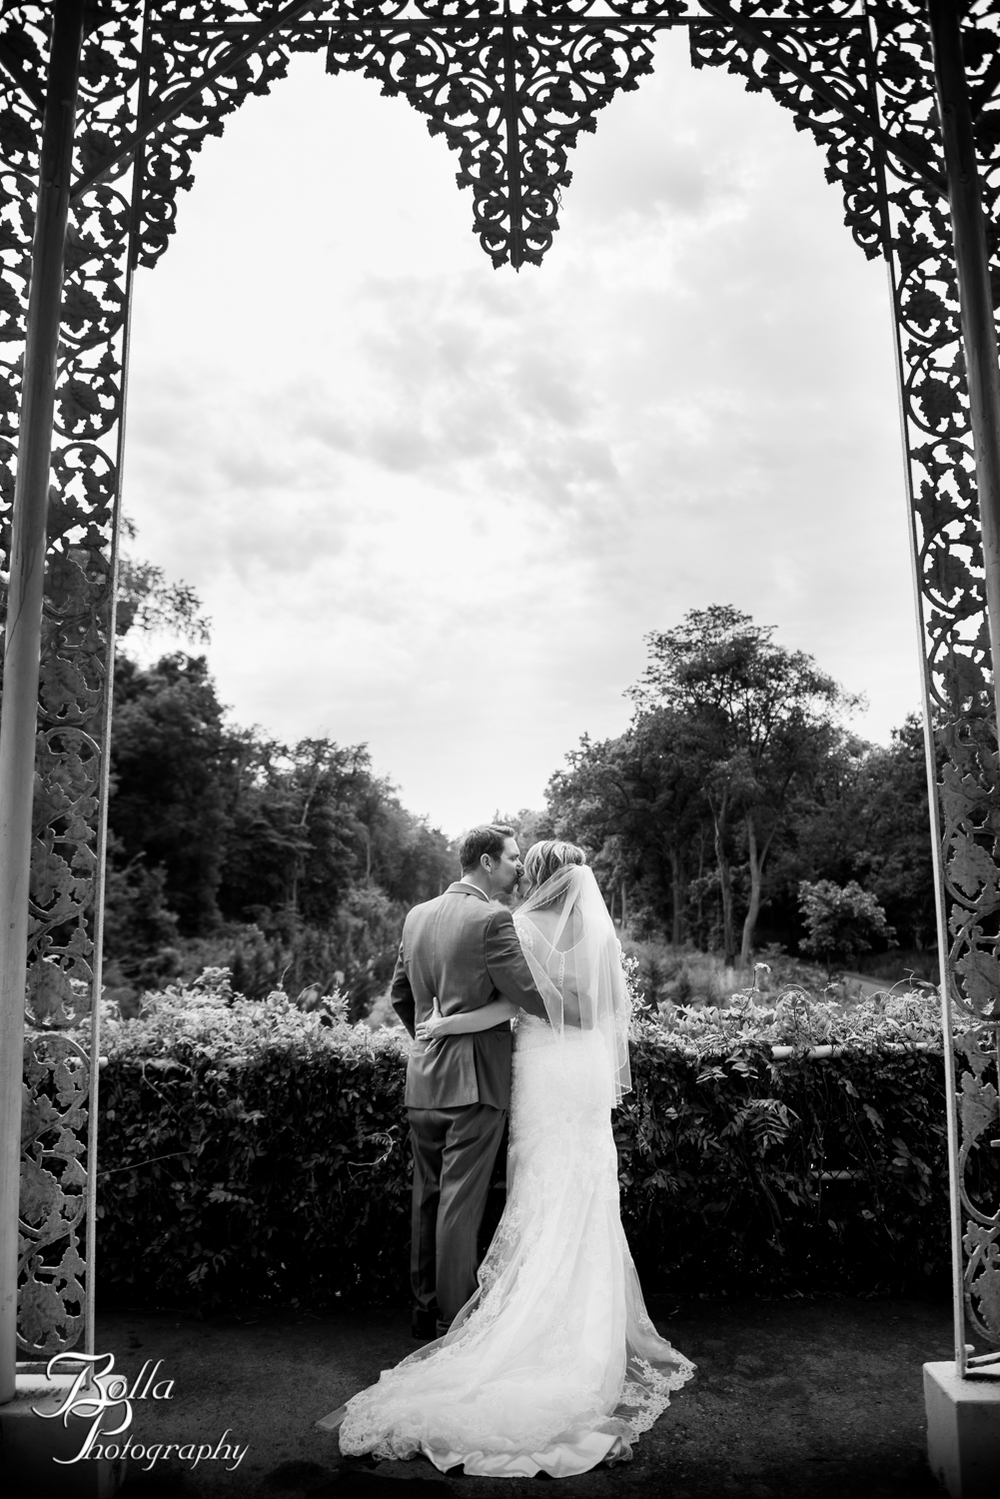 Bolla_Photography_St_Louis_wedding_photographer-0360-2.jpg